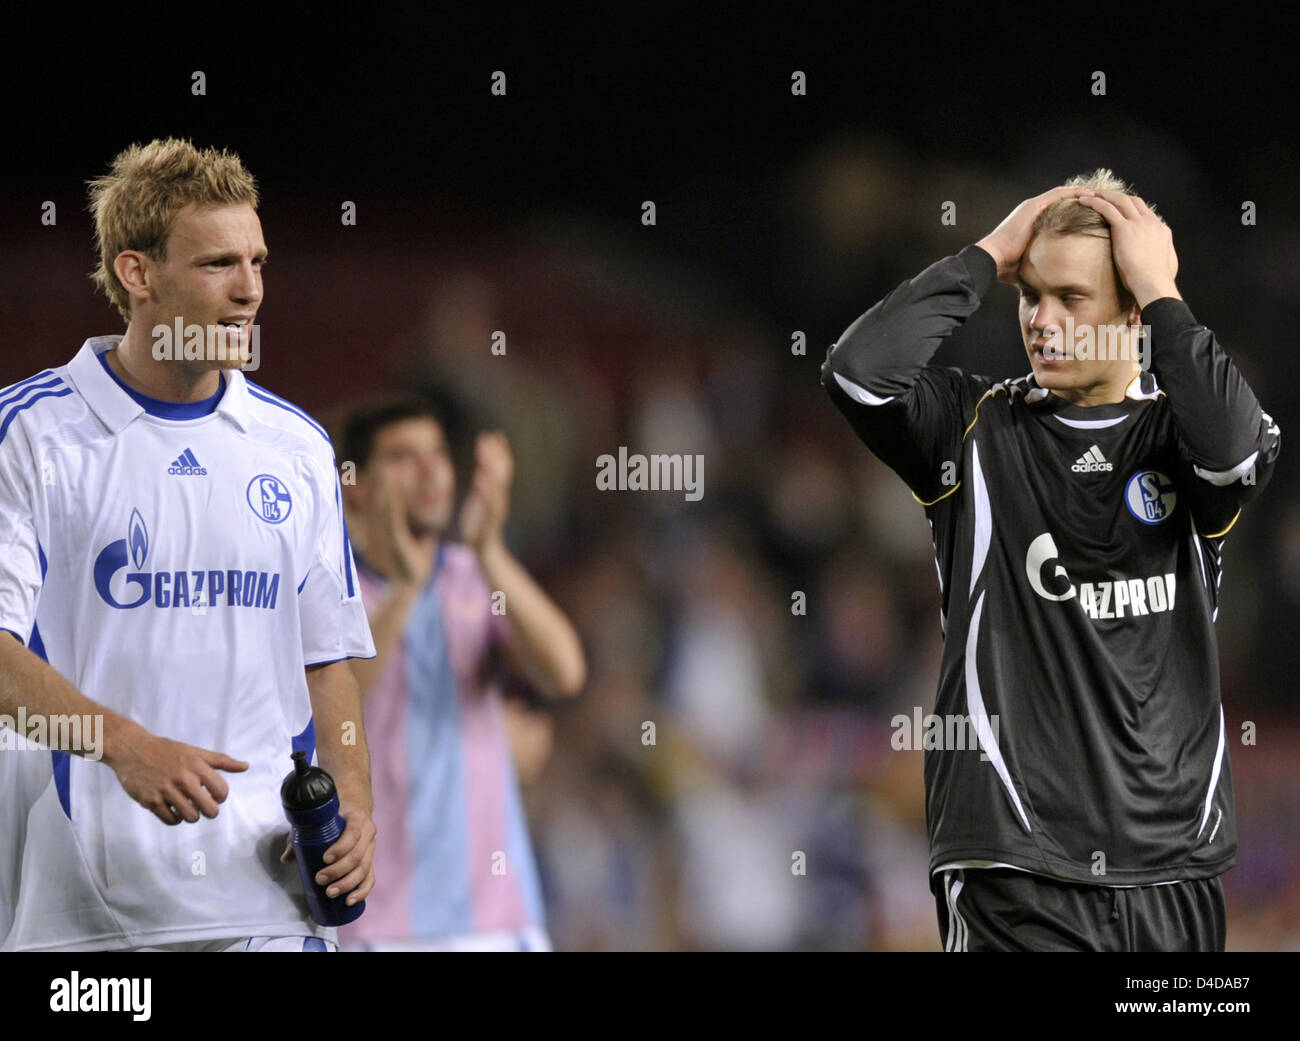 Schalke's Soerne Larsen (L) and Manuel Neuer (R) leave the pitch after the UEFA Champions League quarter-finals - Stock Image